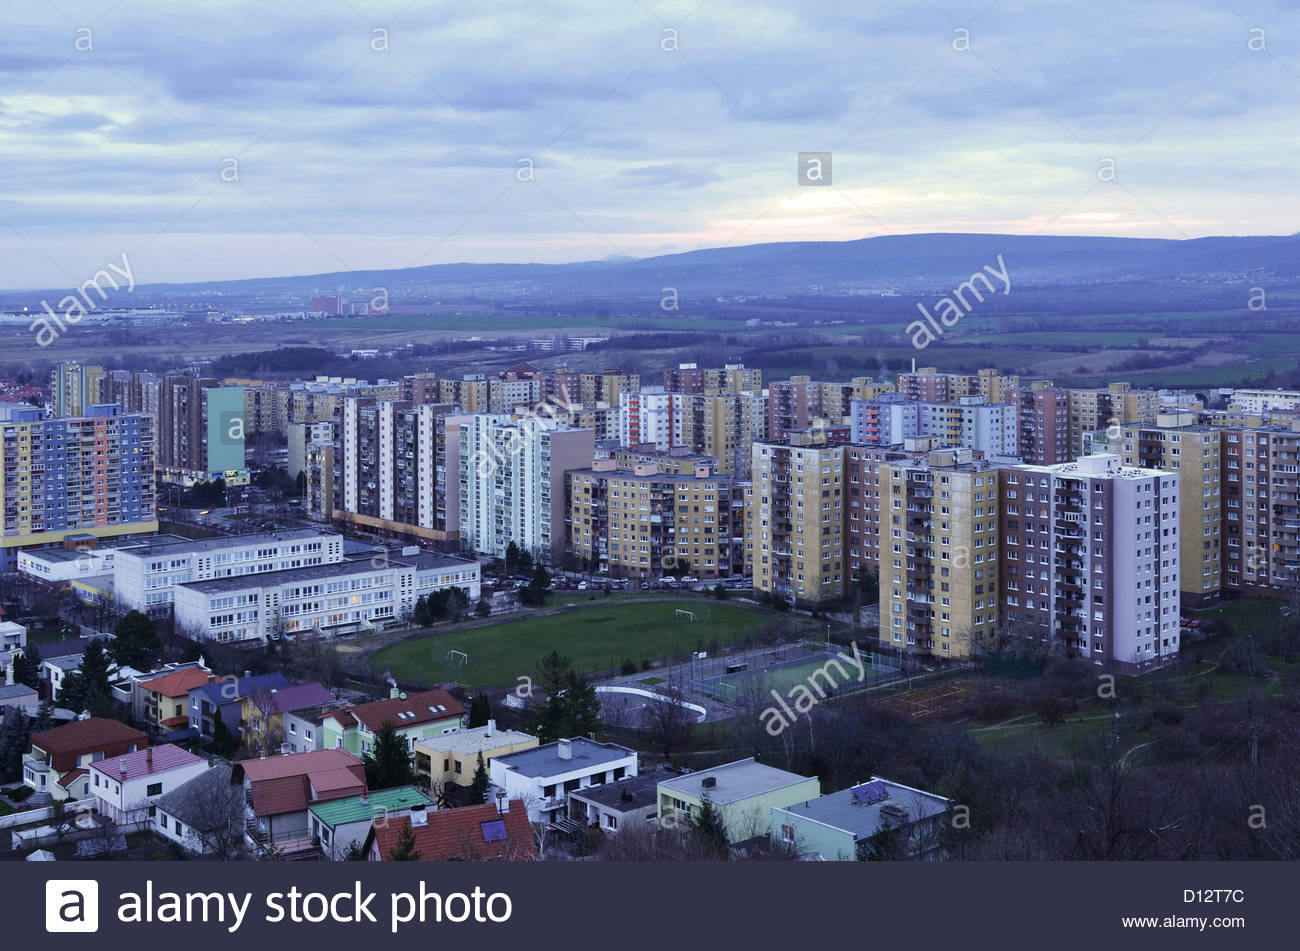 Devinska Nova Ves (borough of Bratislava) Slovakia socialist blocks of flats dull winter day. - Stock Image